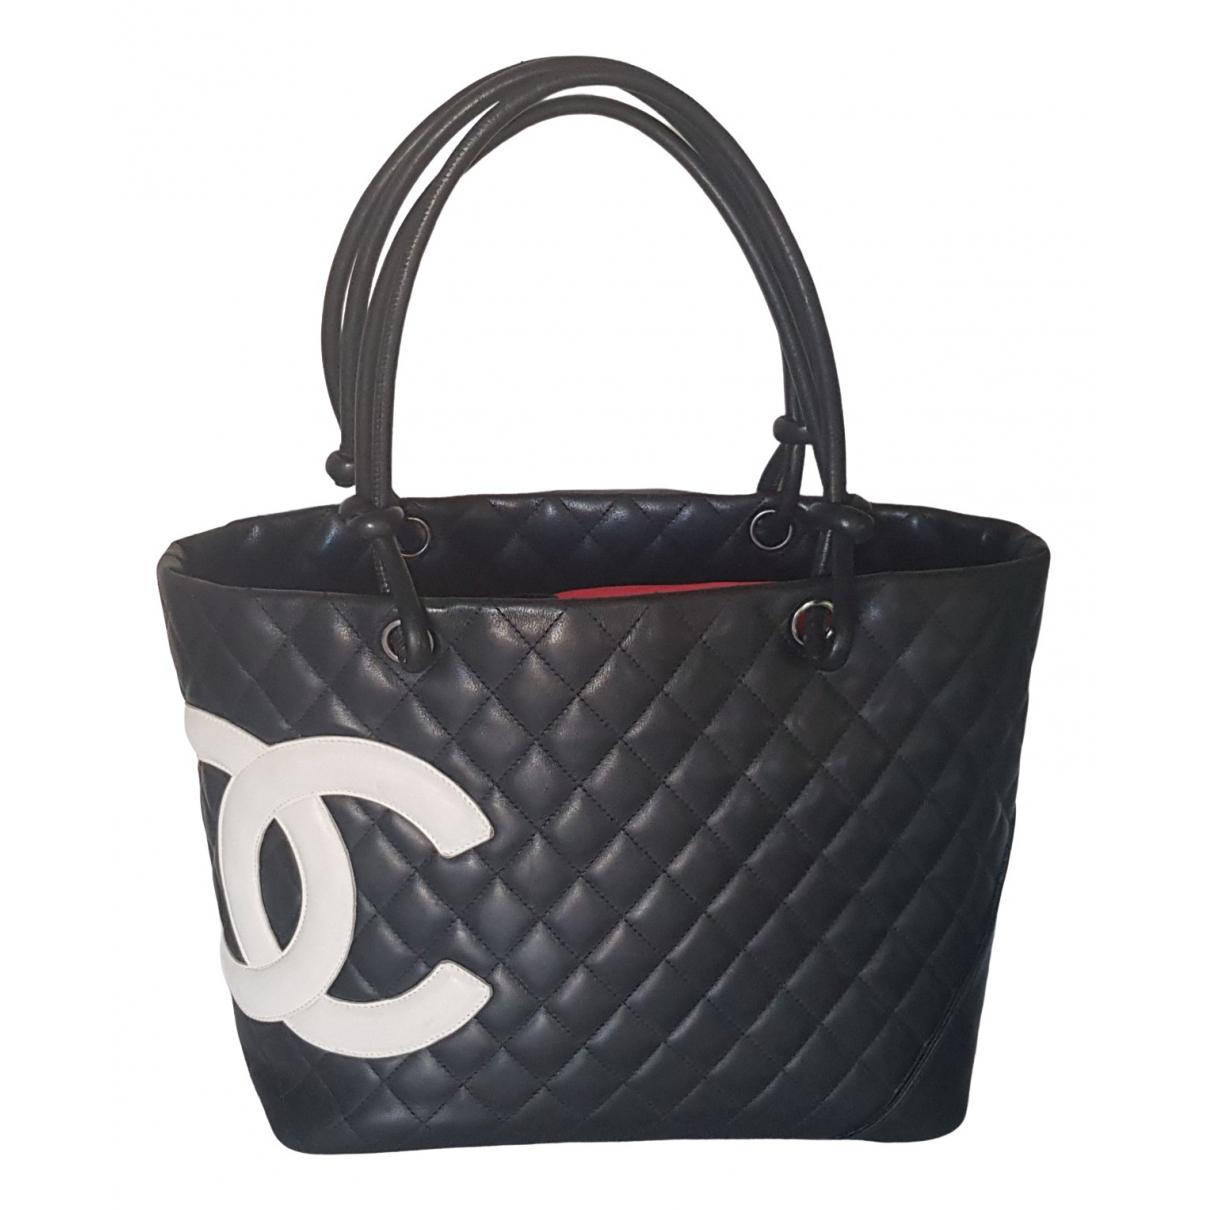 Chanel Cambon Black Leather handbag for Women \N